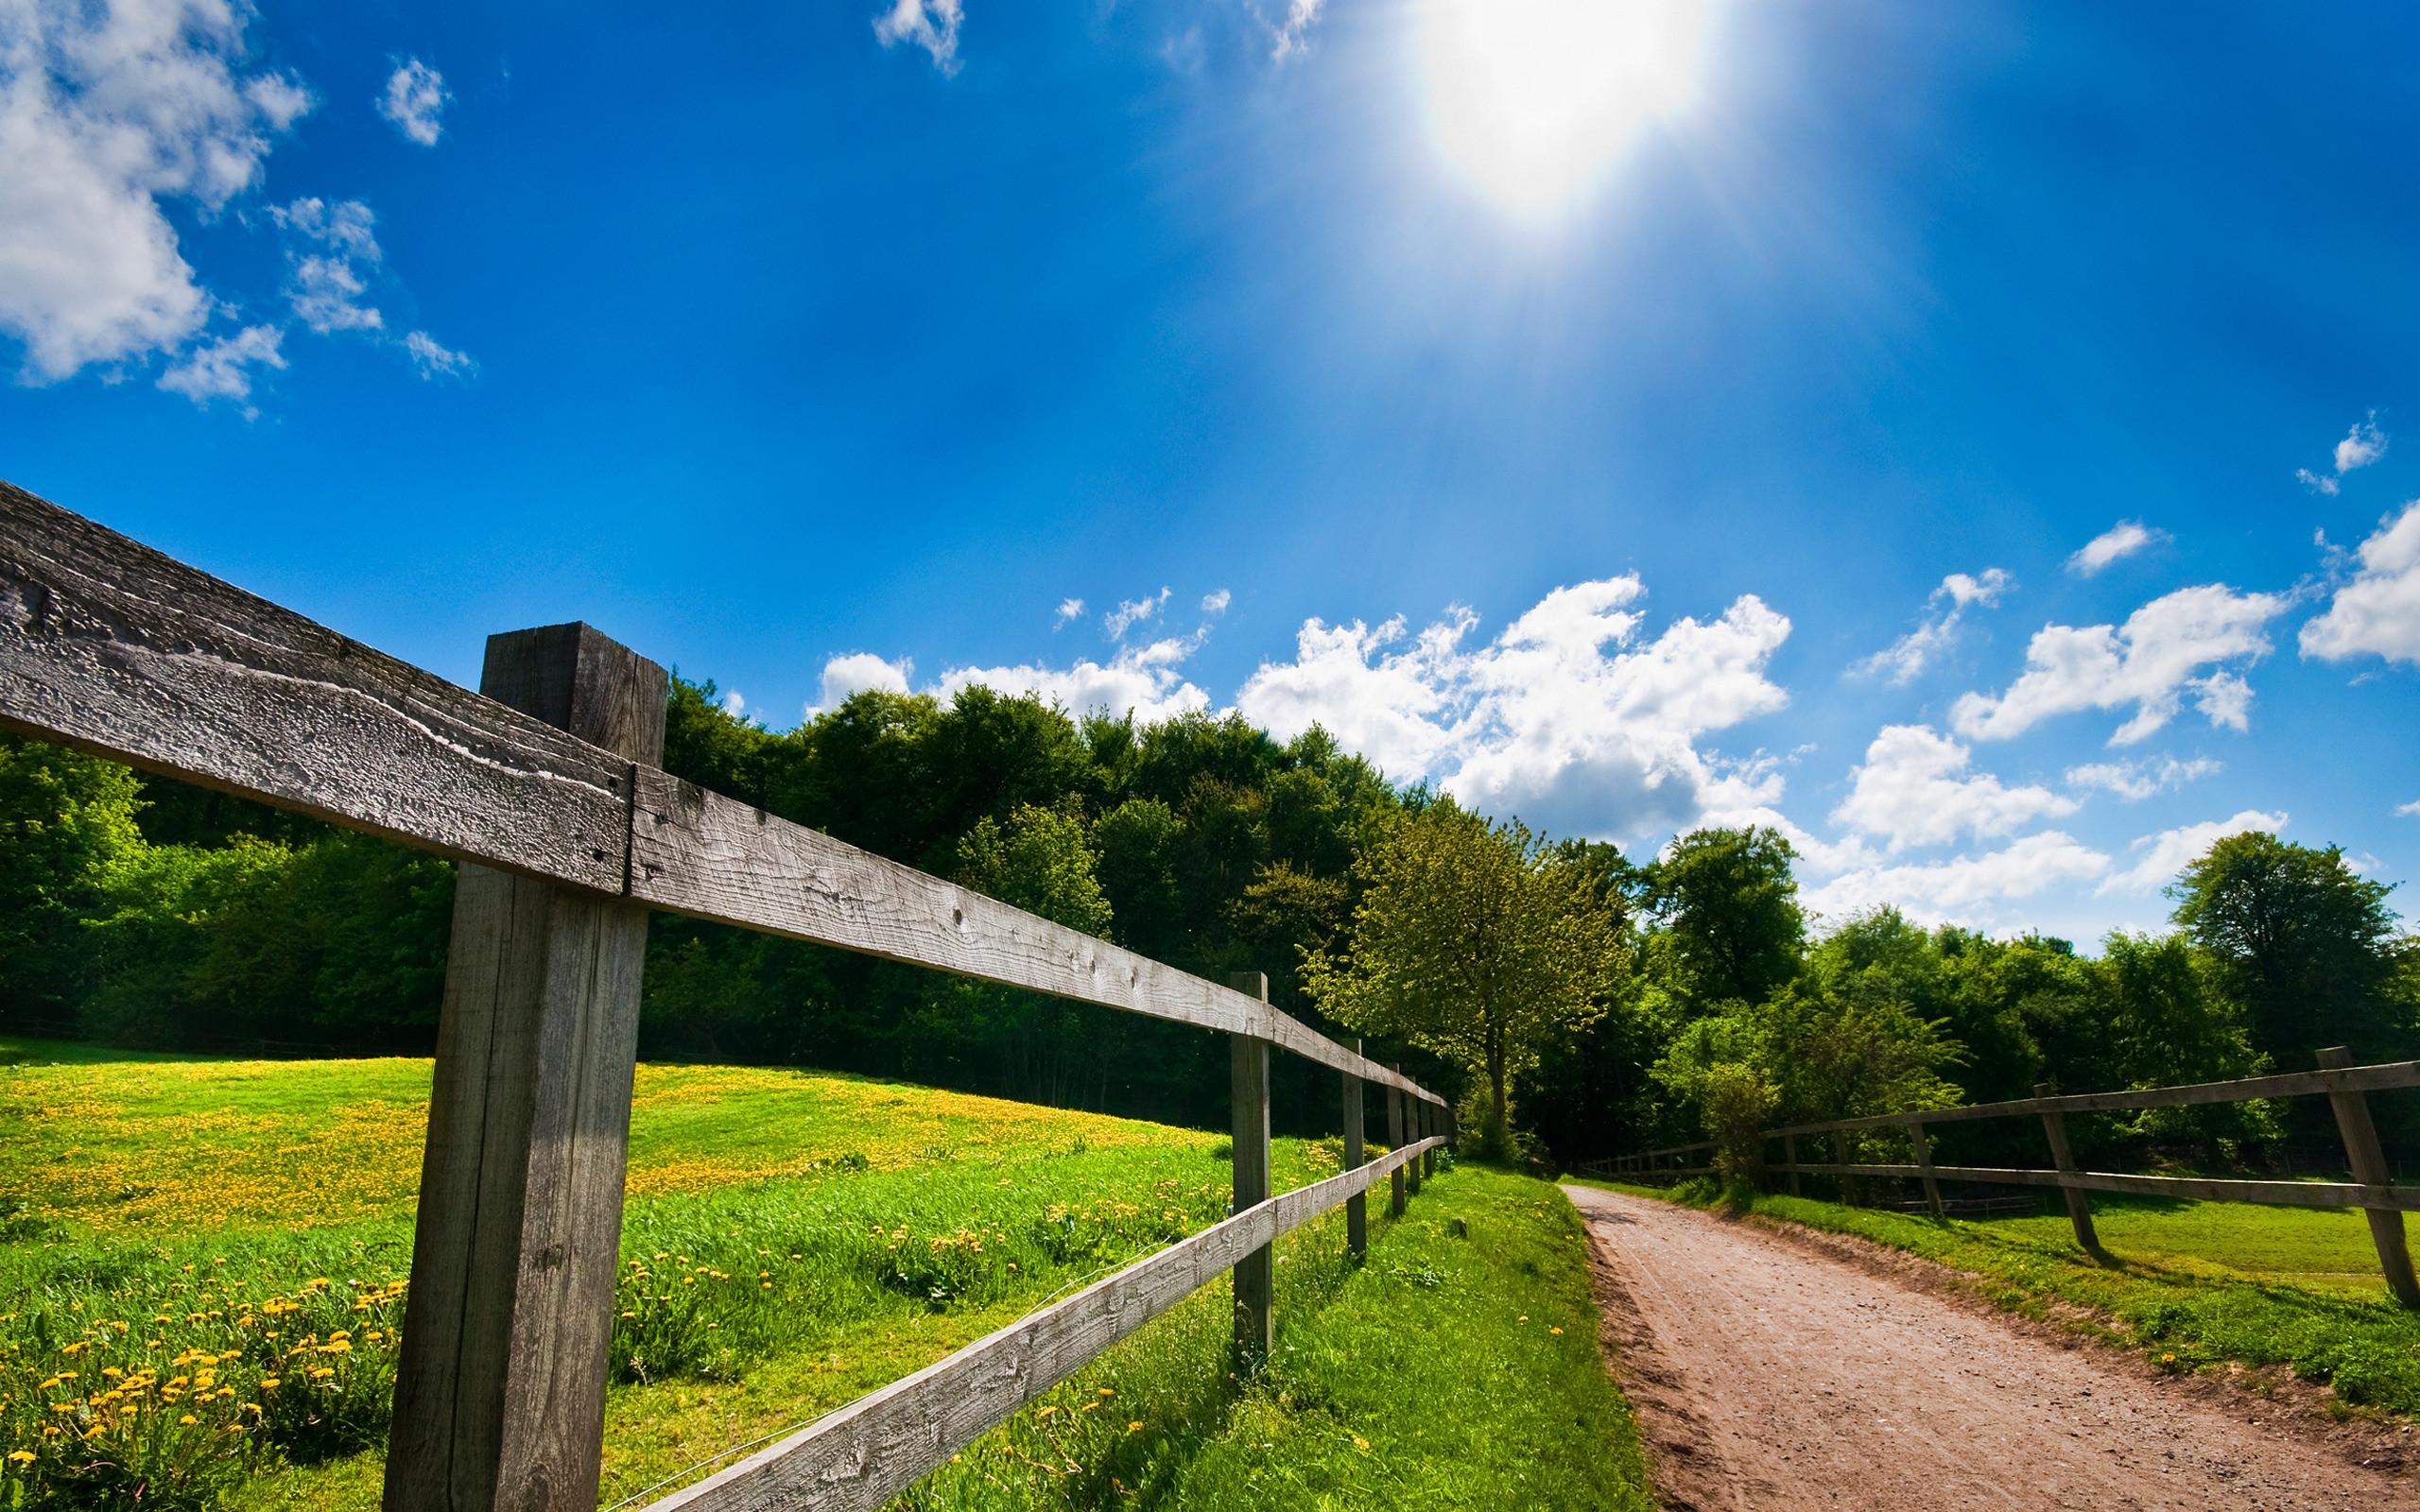 Res: 2560x1600, Farm Fence Wide Wallpaper 50435